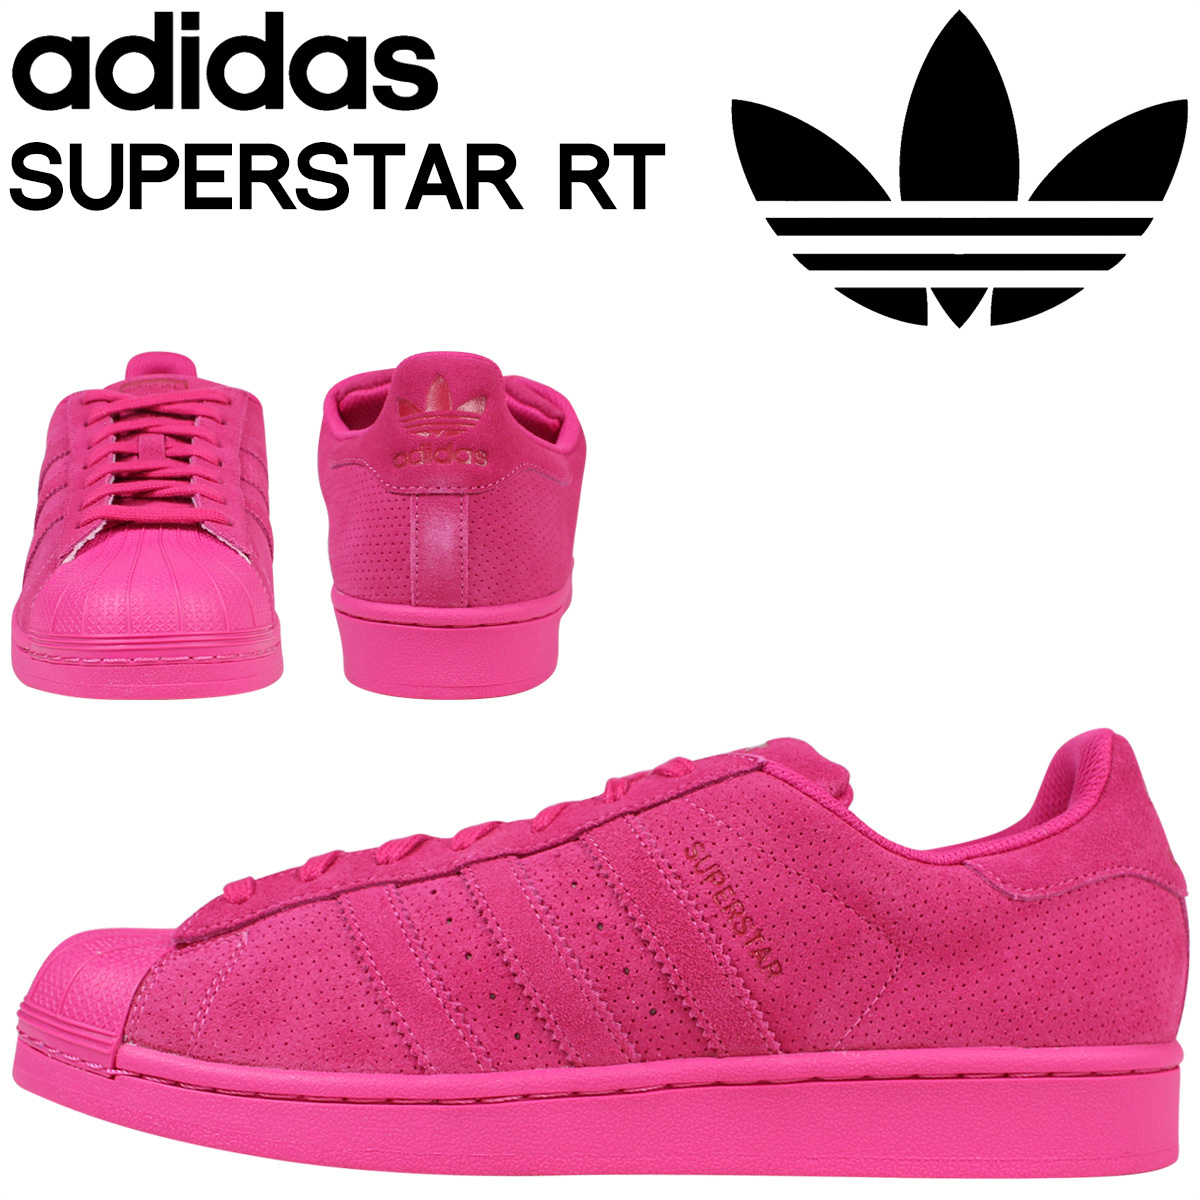 adidas Originals adidas originals superstar sneakers SUPERSTAR RT AQ4166 men\u0027s  shoes pink